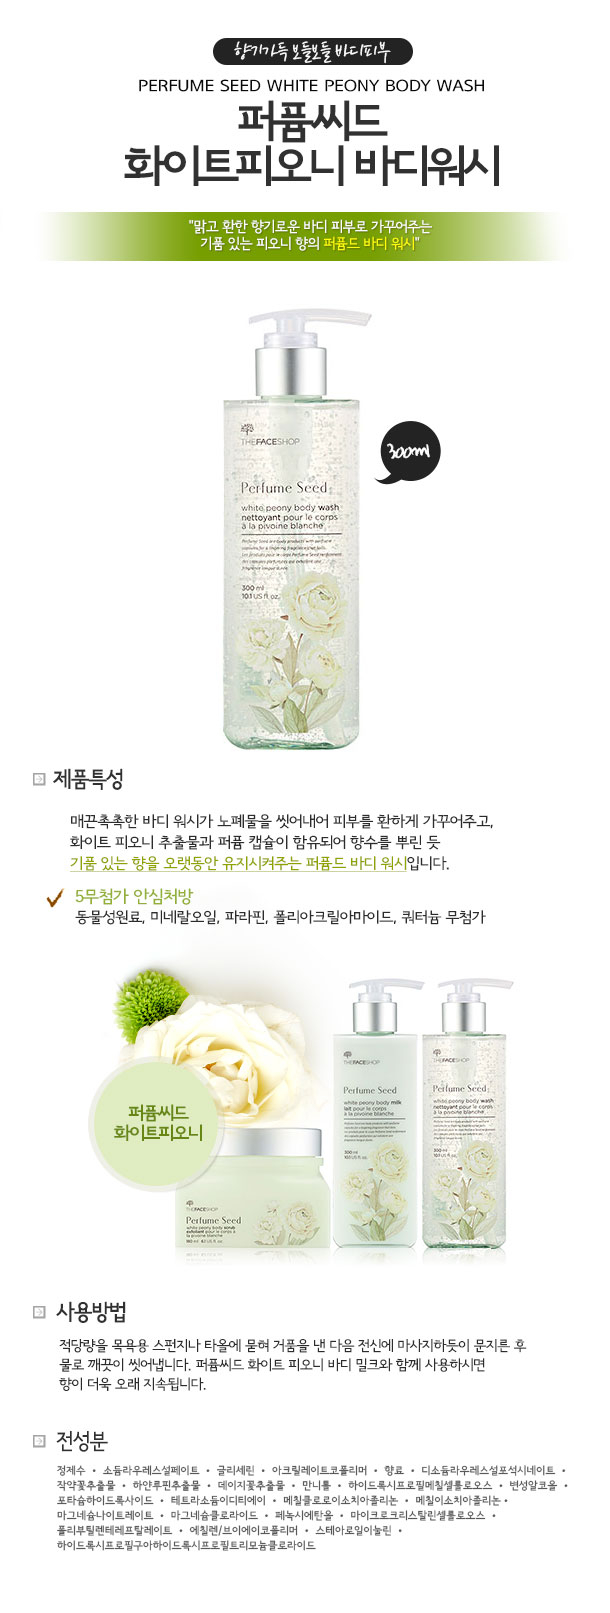 Perfume Seed White Peony Body Wash